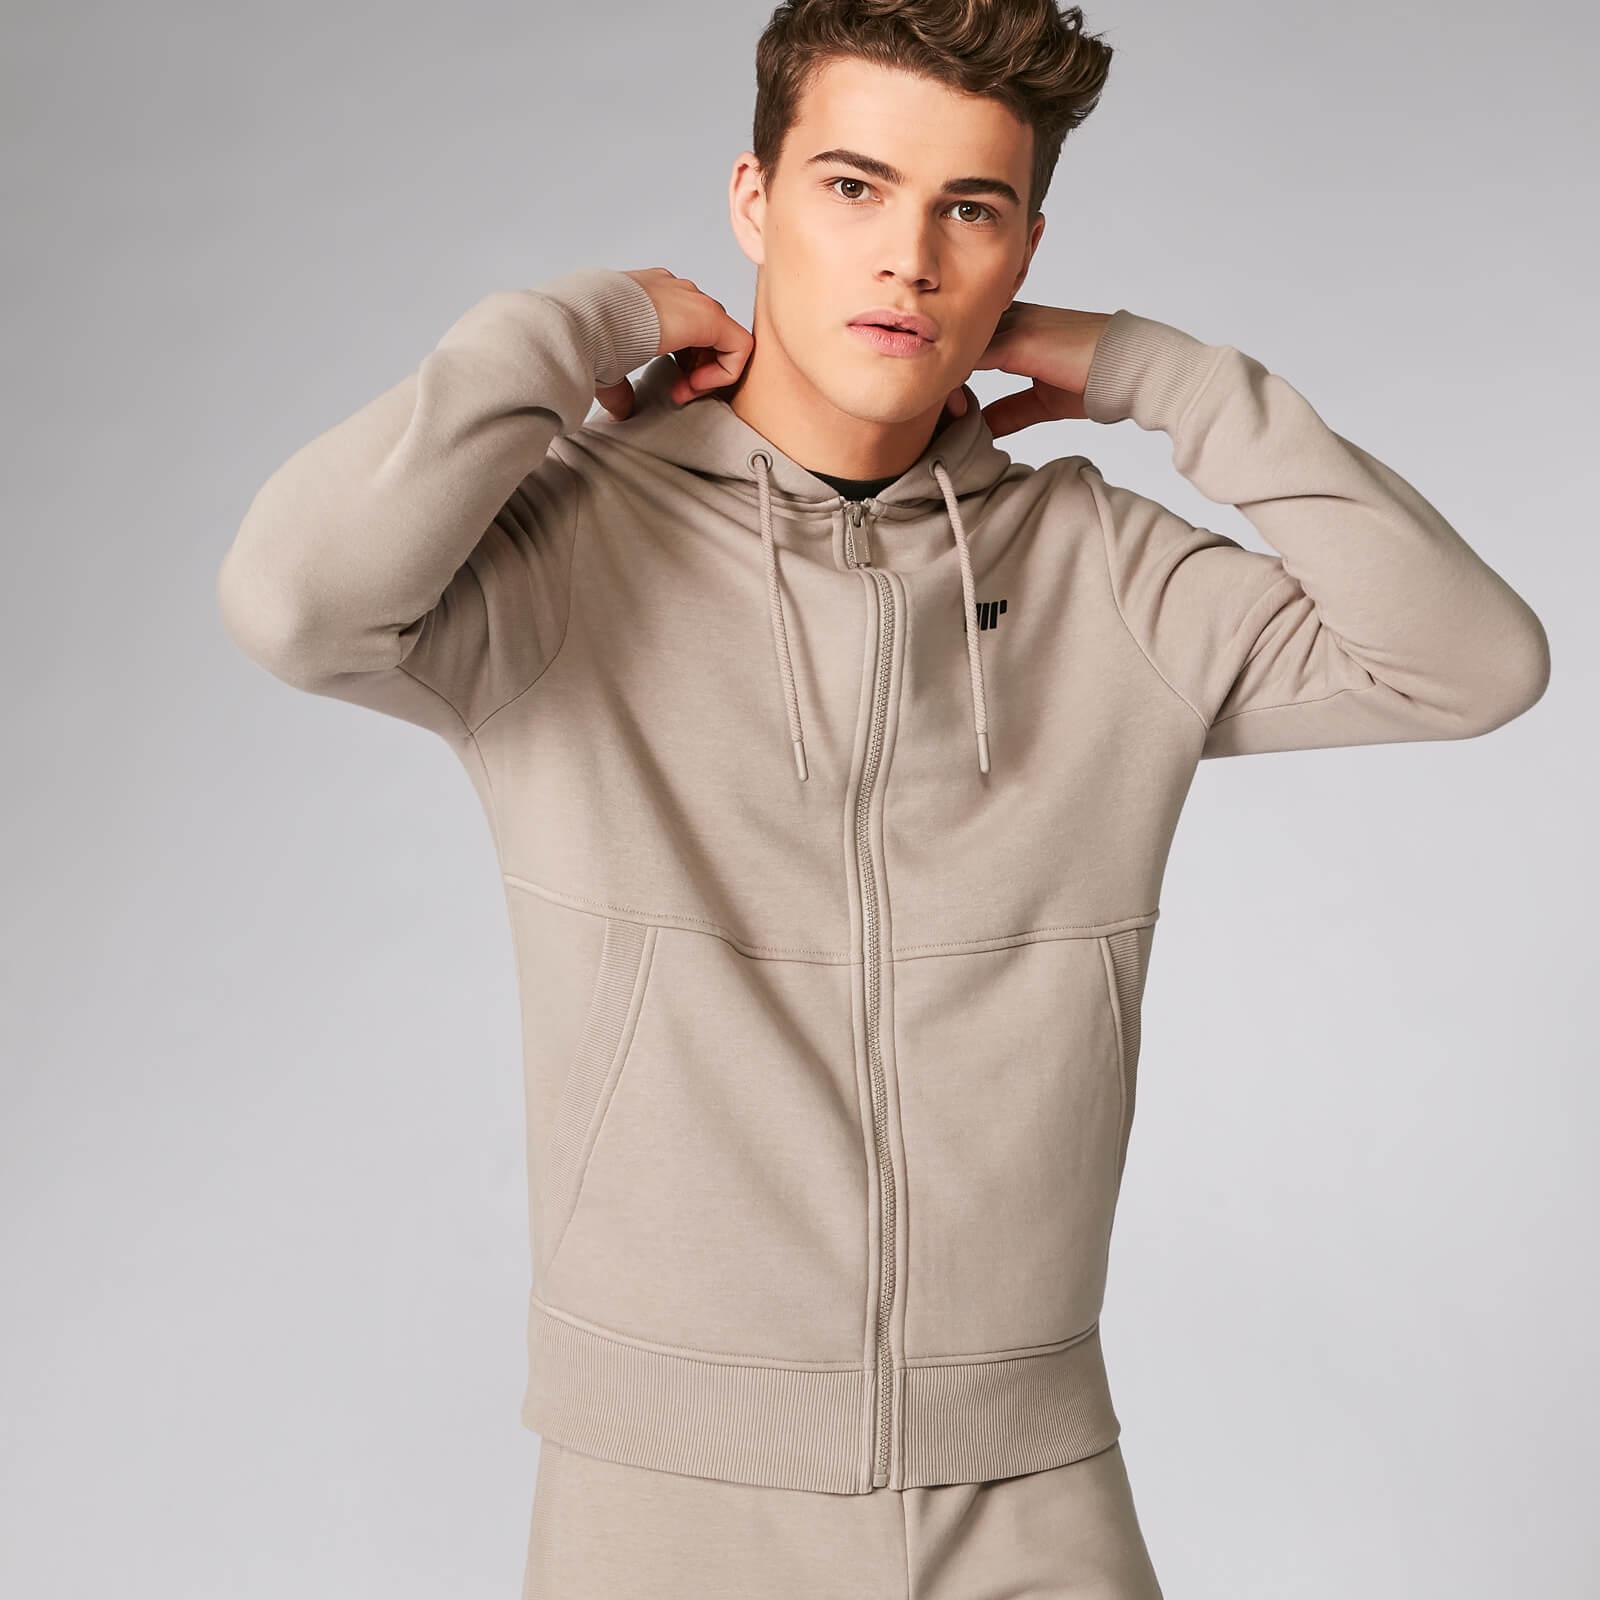 534756be9 Férfi Tru-Fit Cipzáras pulóver 2.0 rendelés | Barna | MYPROTEIN™